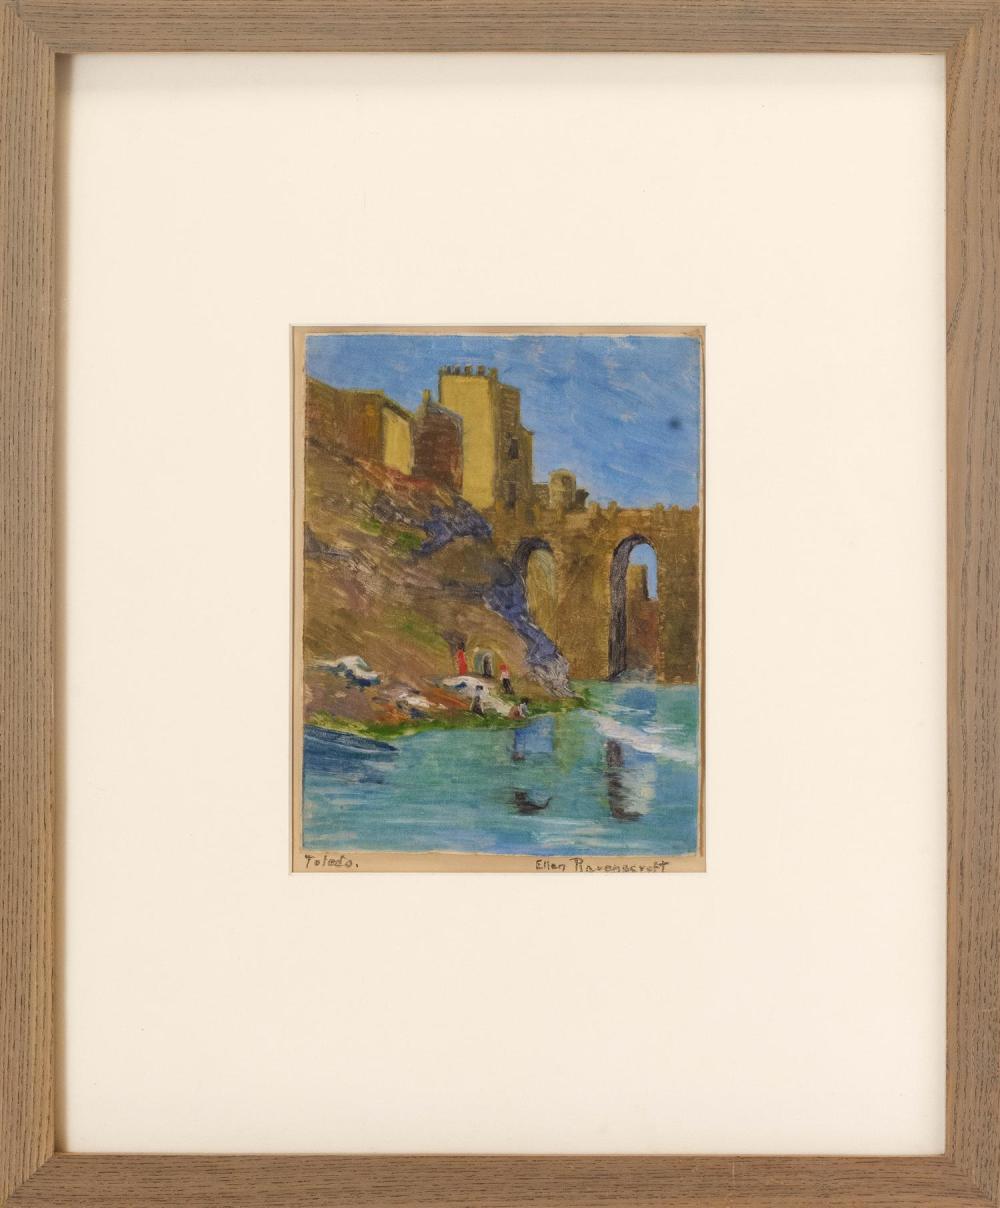 "ELLEN RAVENSCROFT, New York/Mississippi, 1876-1949, ""Toledo""., Monotype print, 9"" x 7"". Framed 21.5"" x 17.5""."